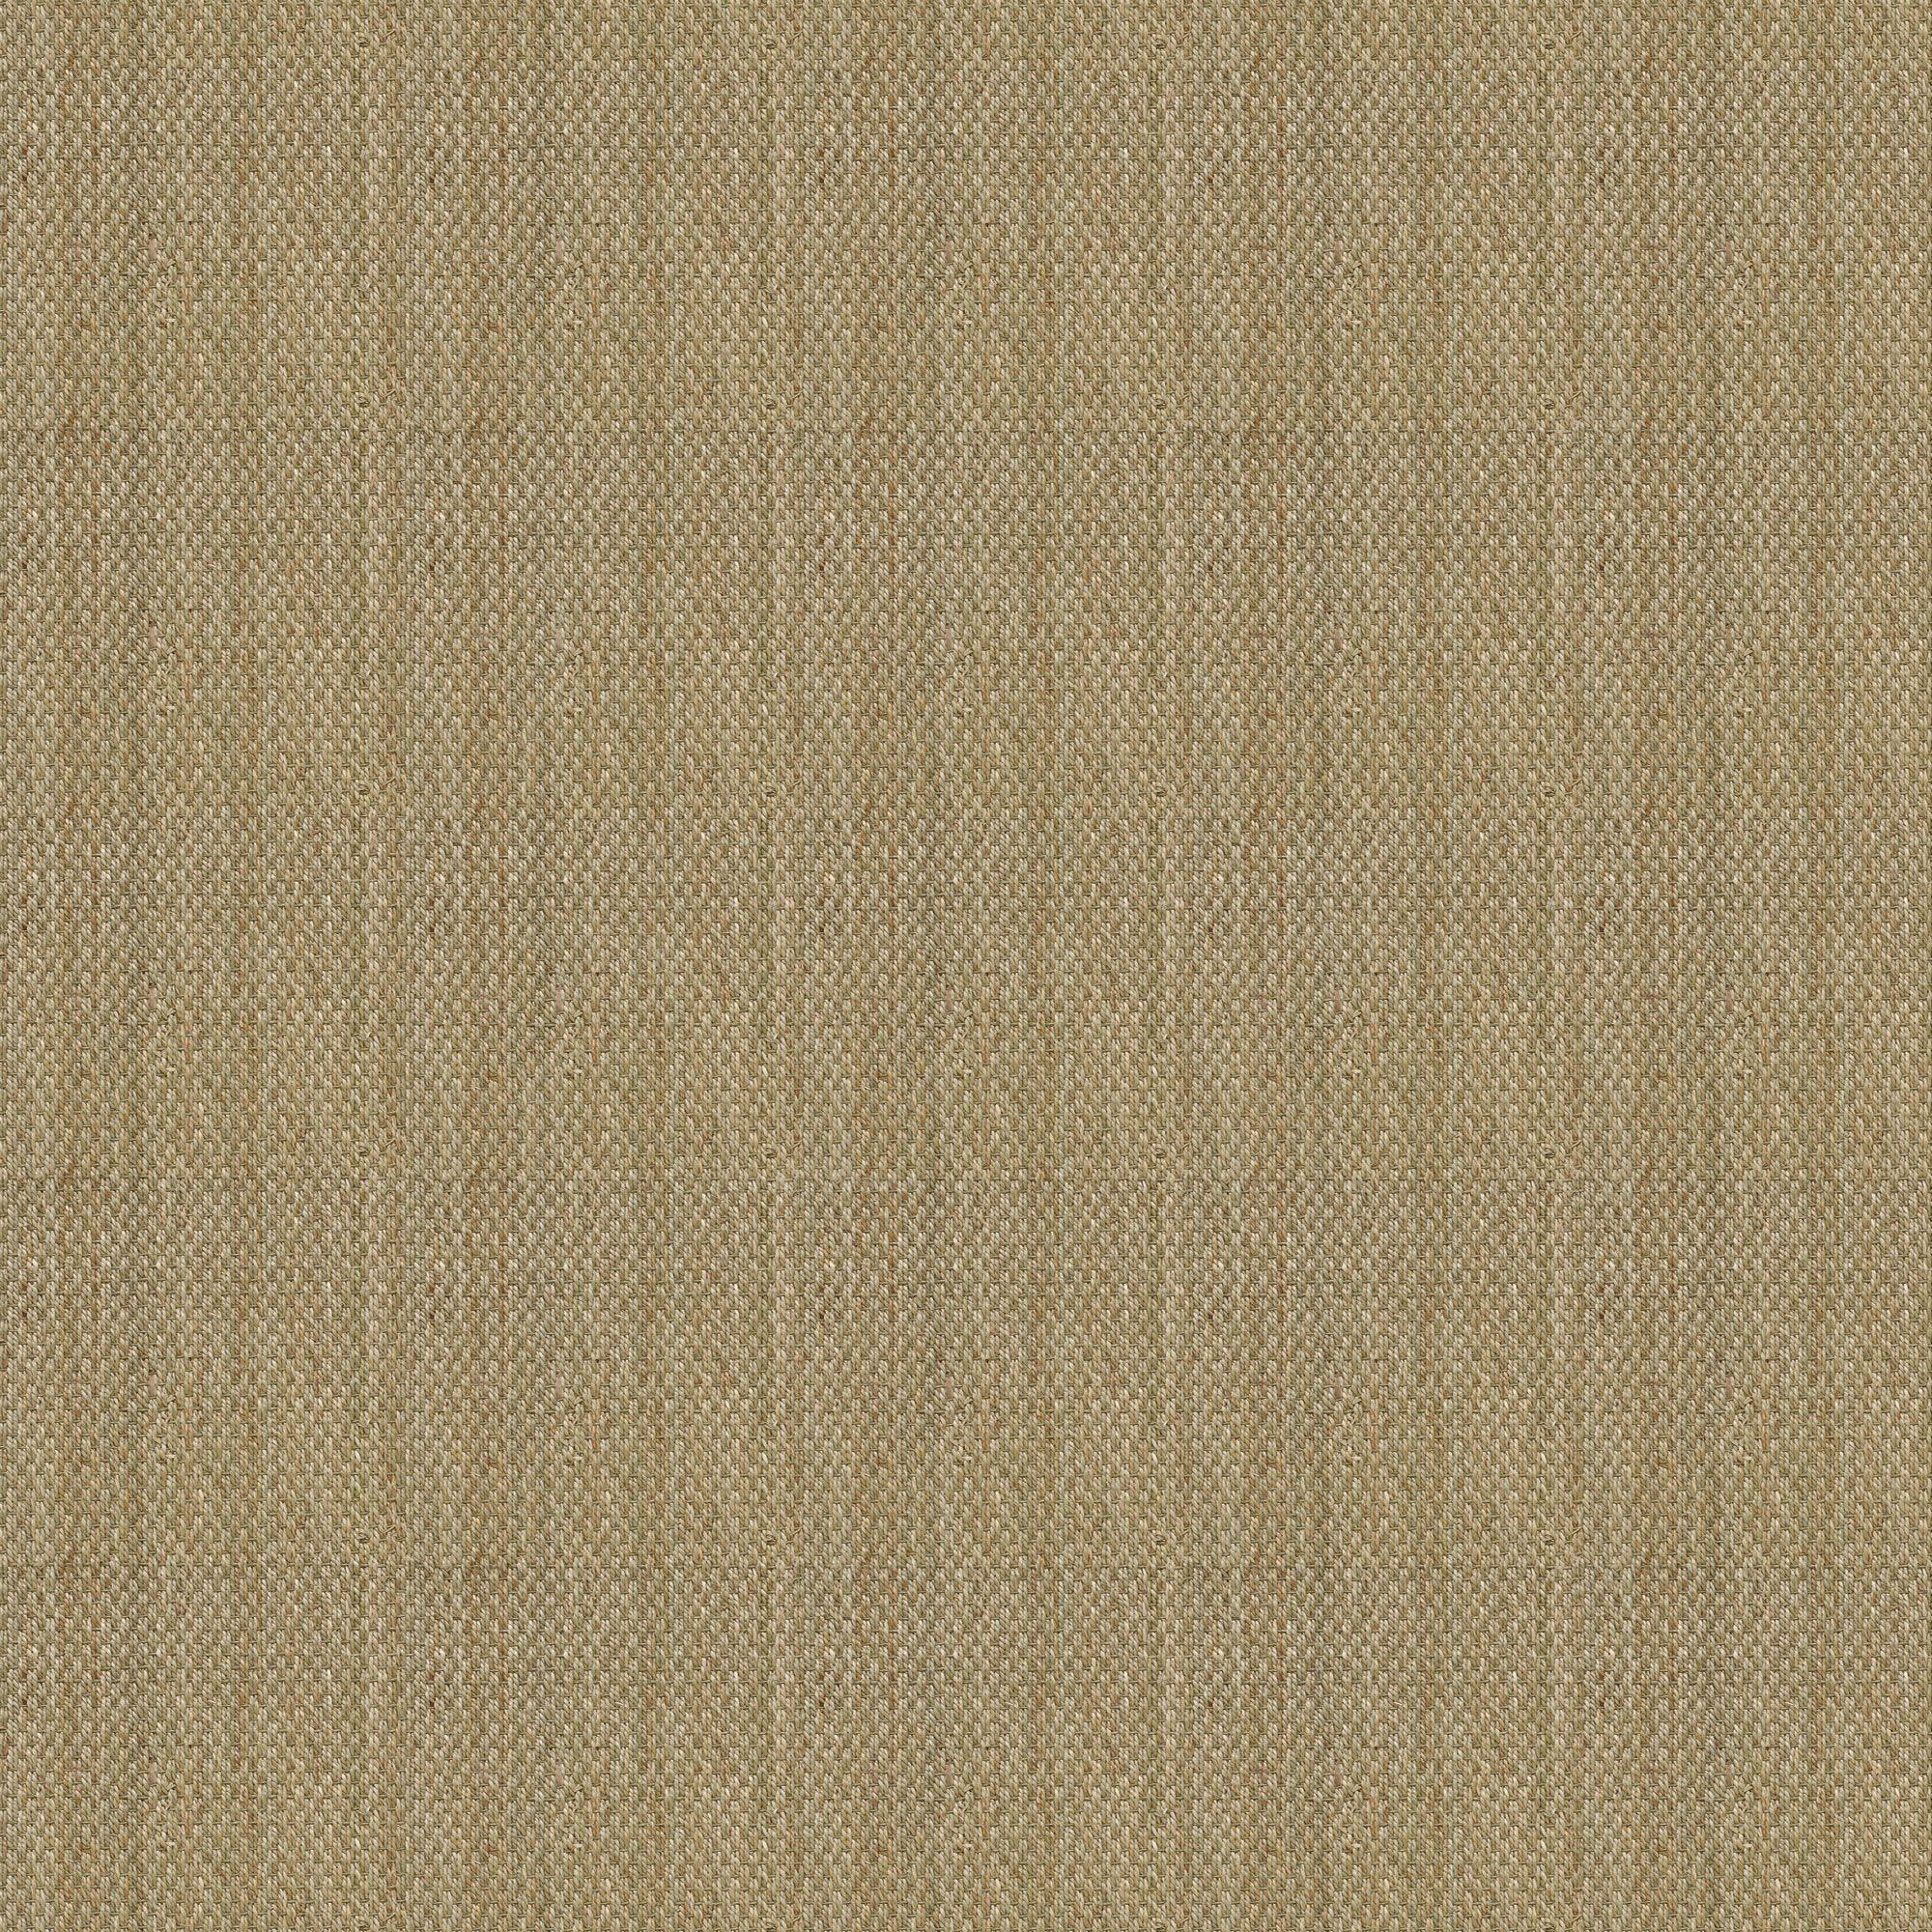 Linen n Wool Black Natural flooring, Sea grass, The